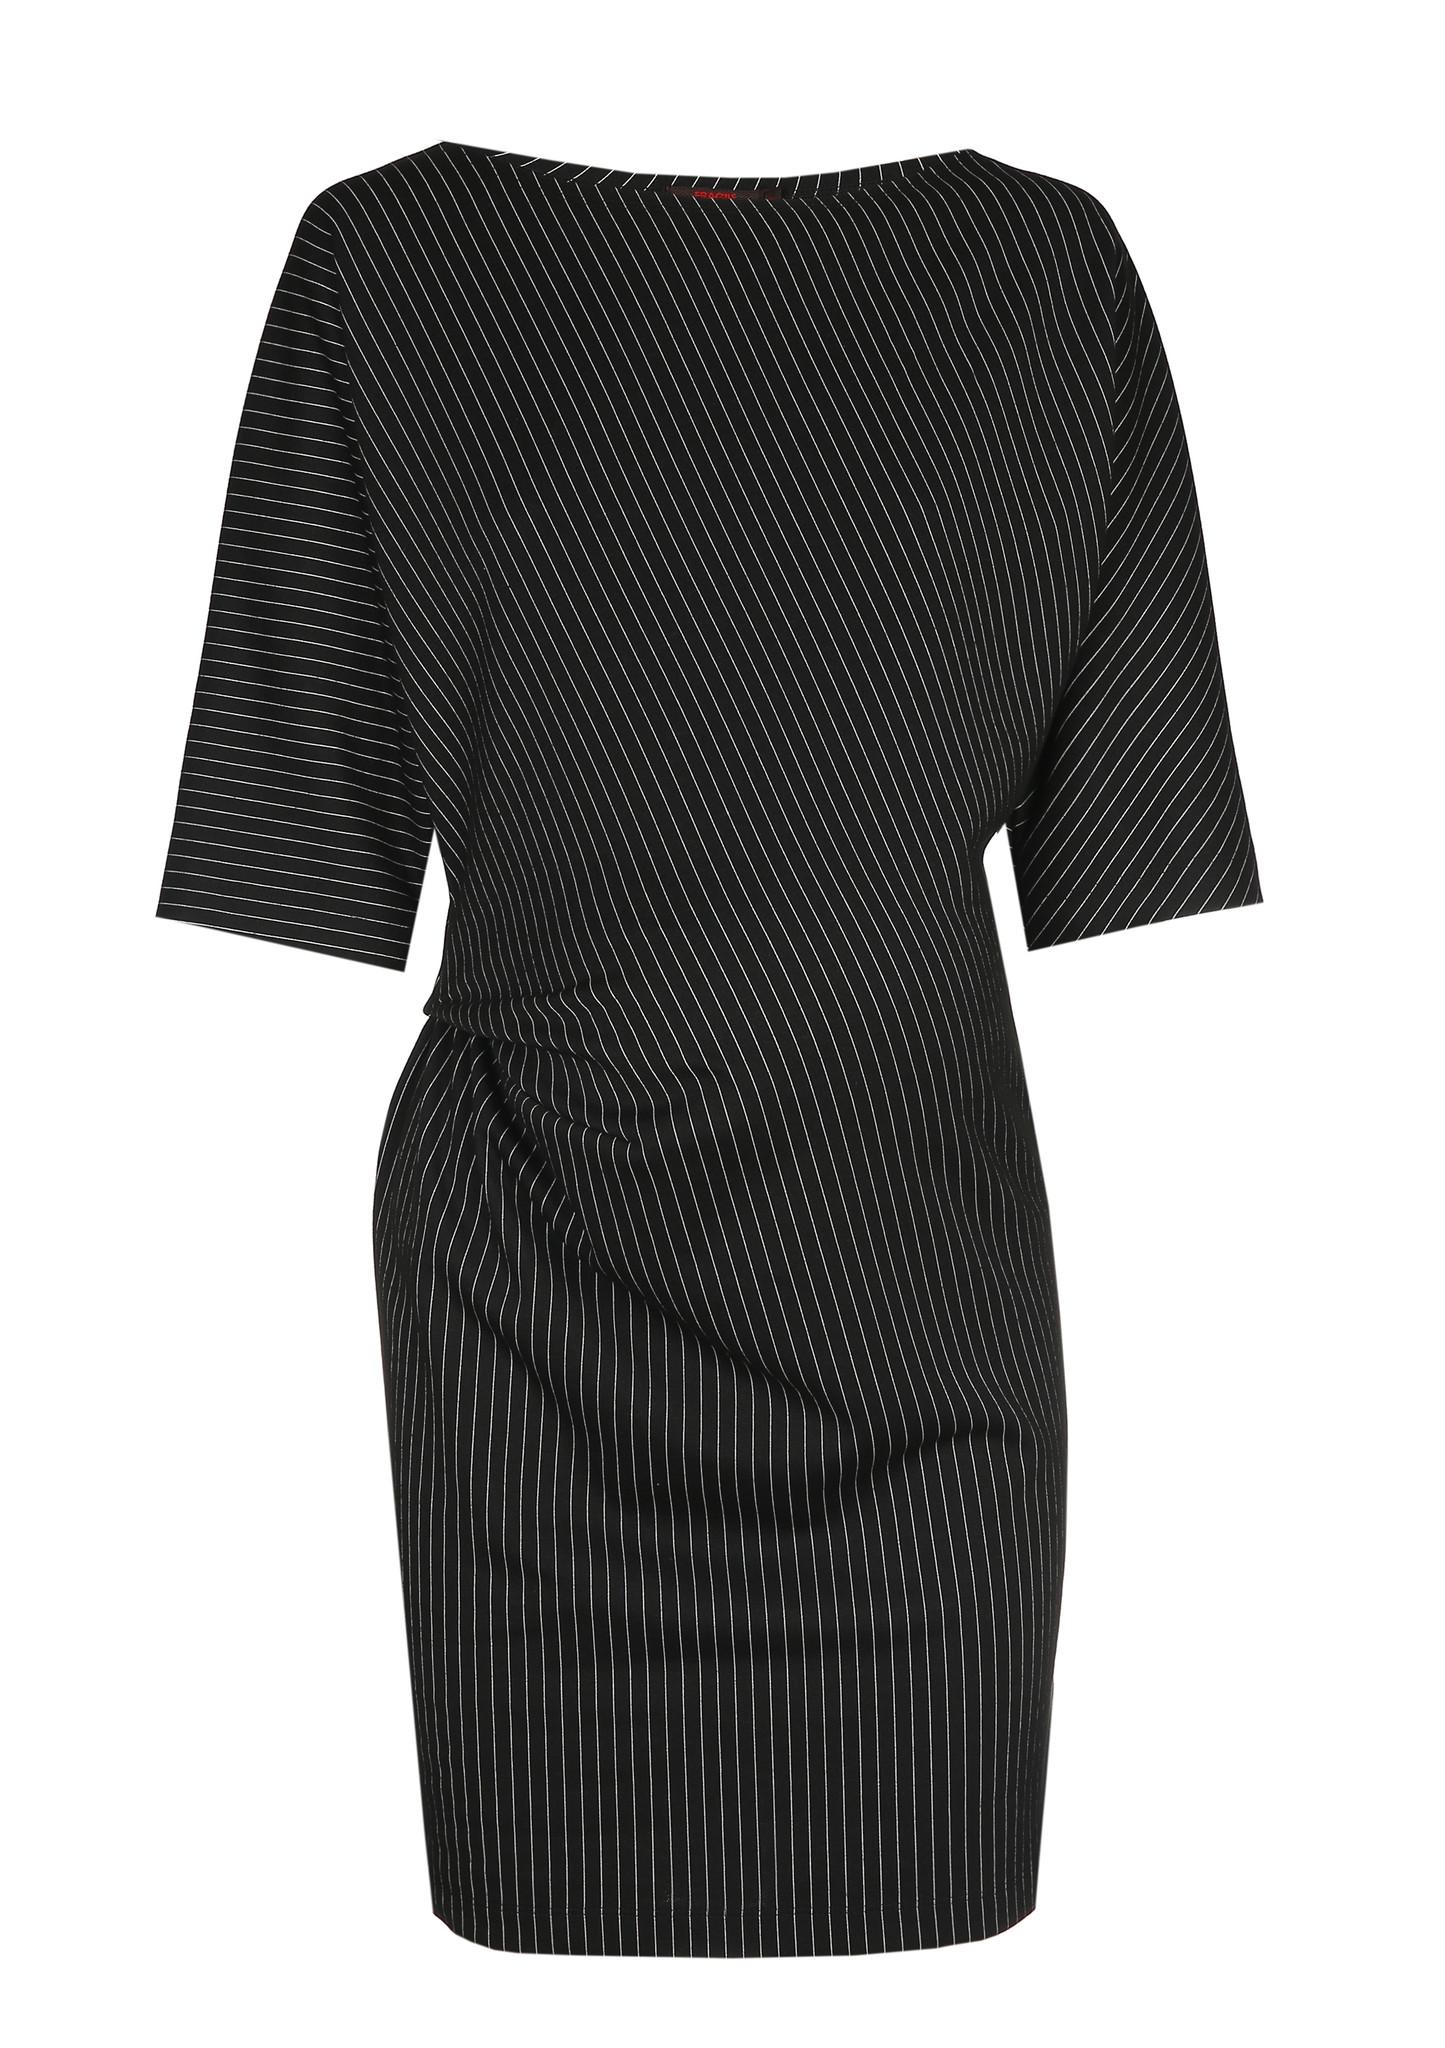 Hipster dress - black-2